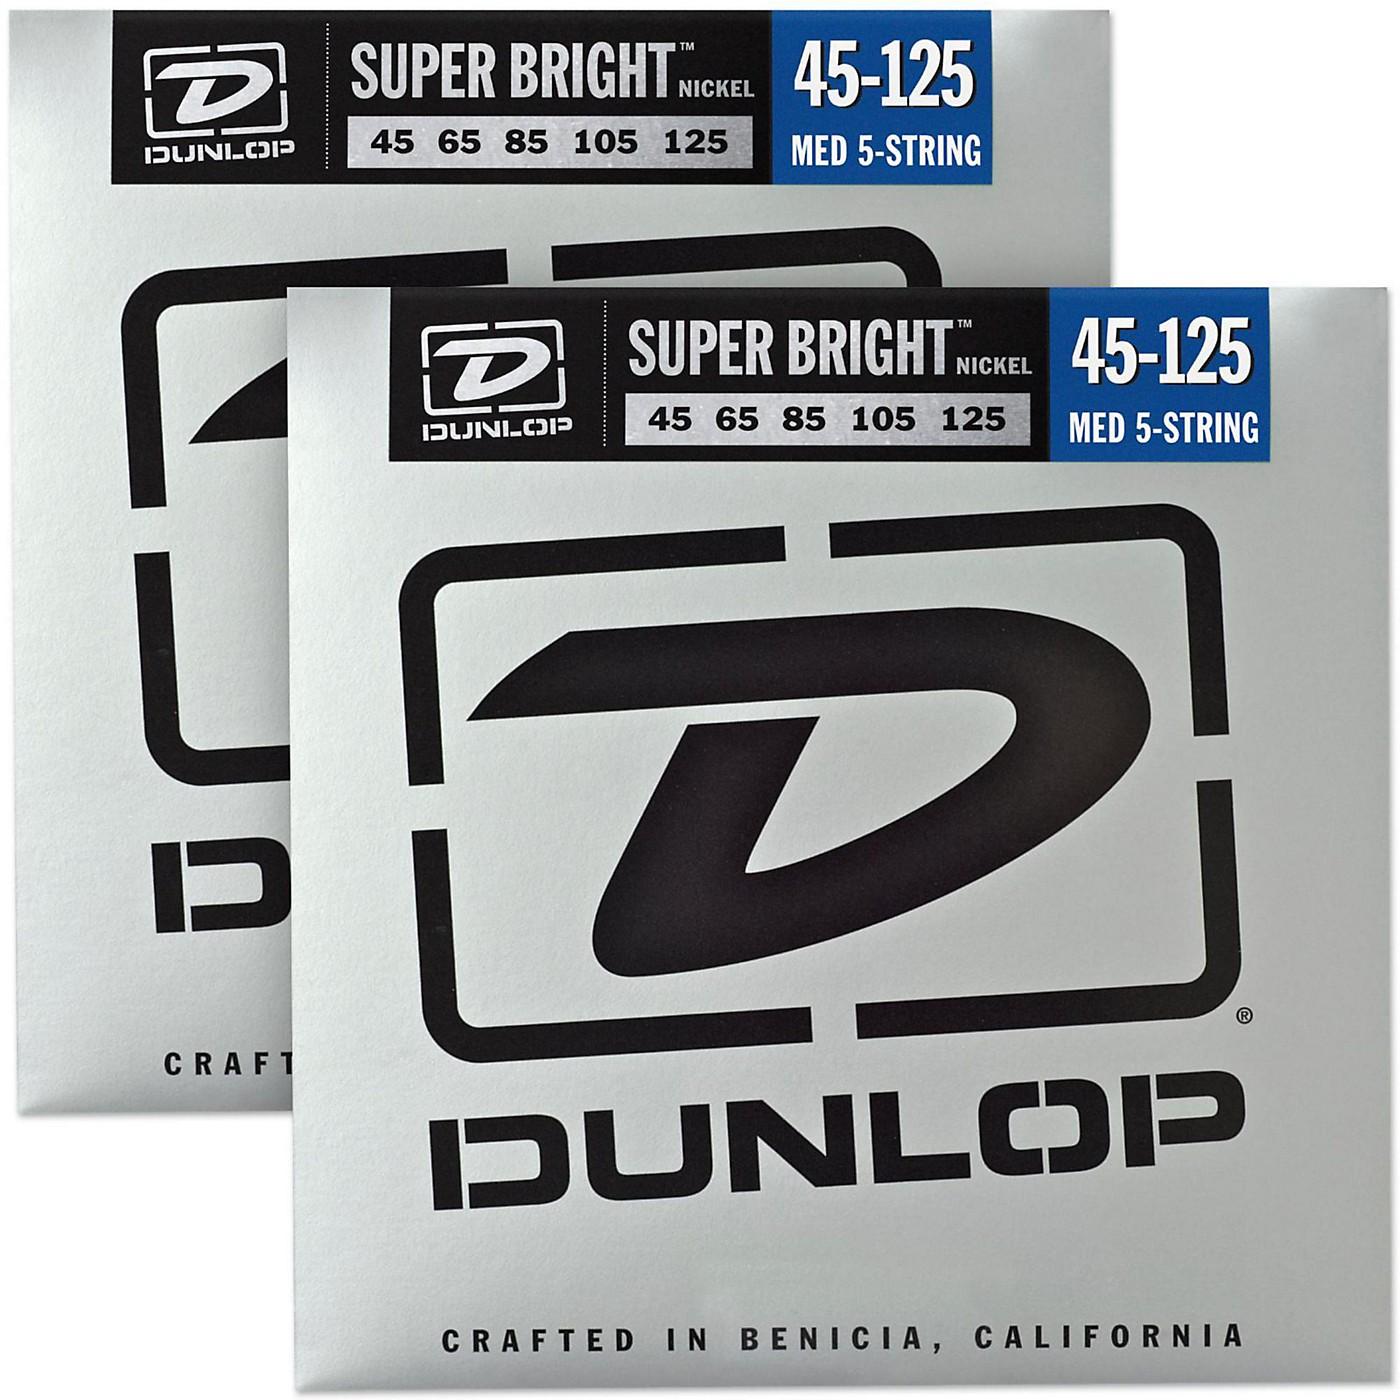 Dunlop Super Bright Nickel Medium 5-String Bass Guitar Strings (45-125) 2-Pack thumbnail